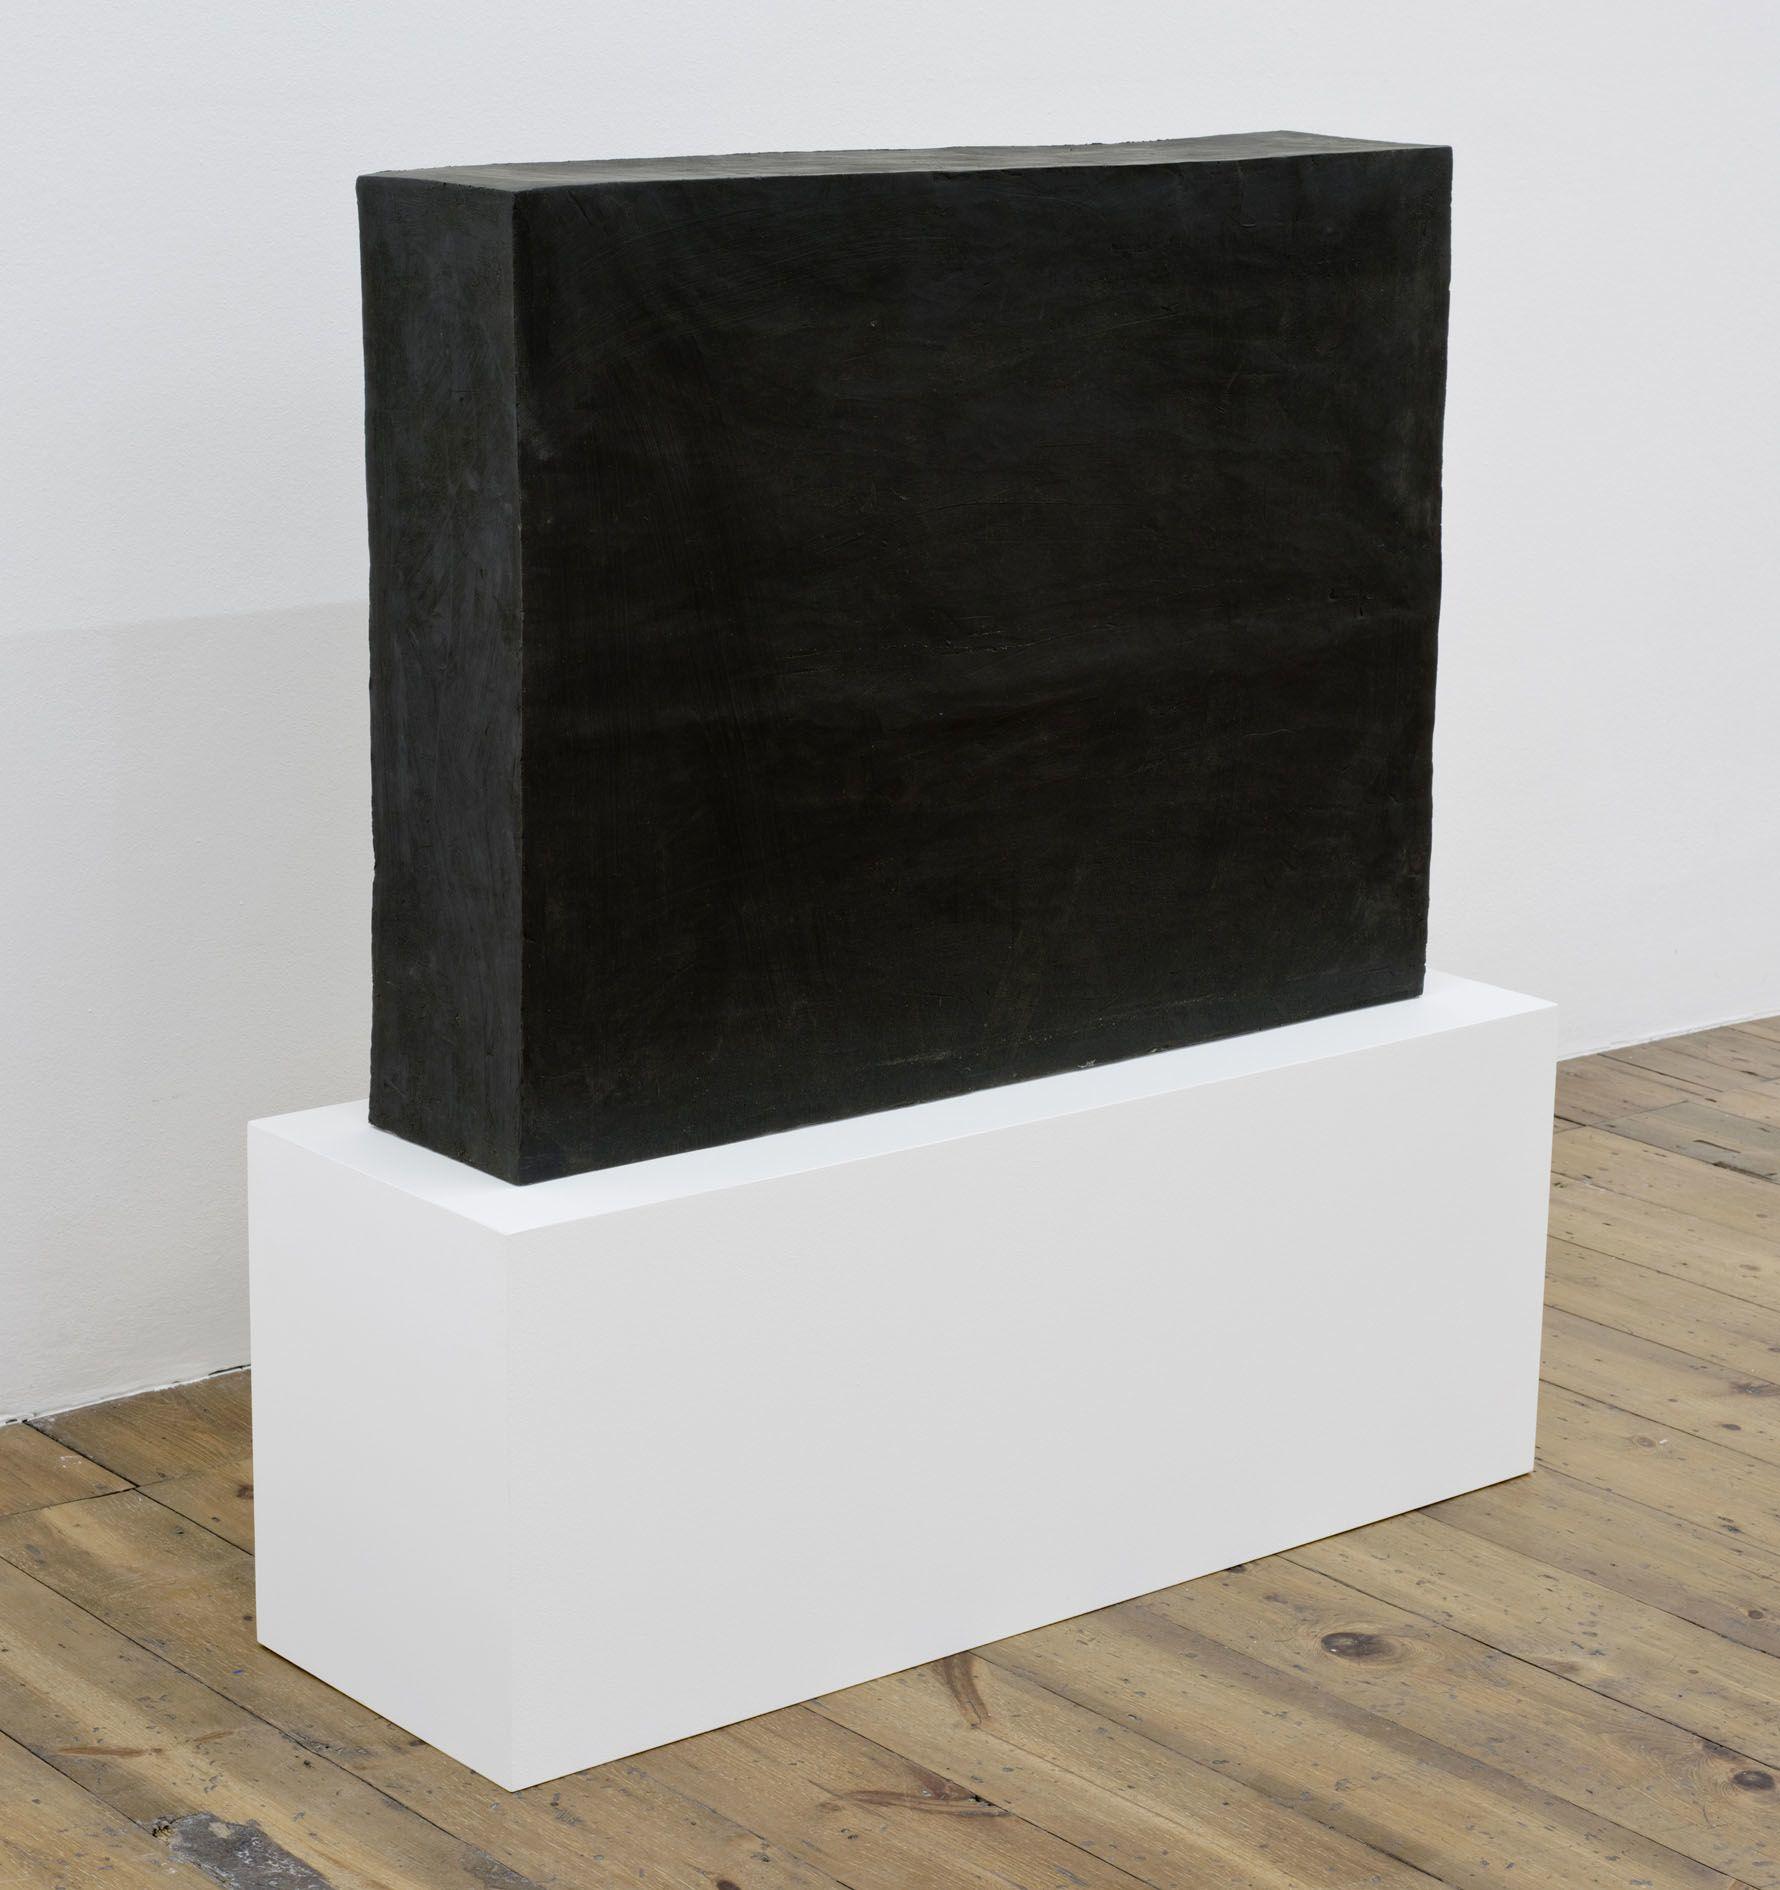 Peter FischliDavid Weiss – Walls, Corners, Tubes – London